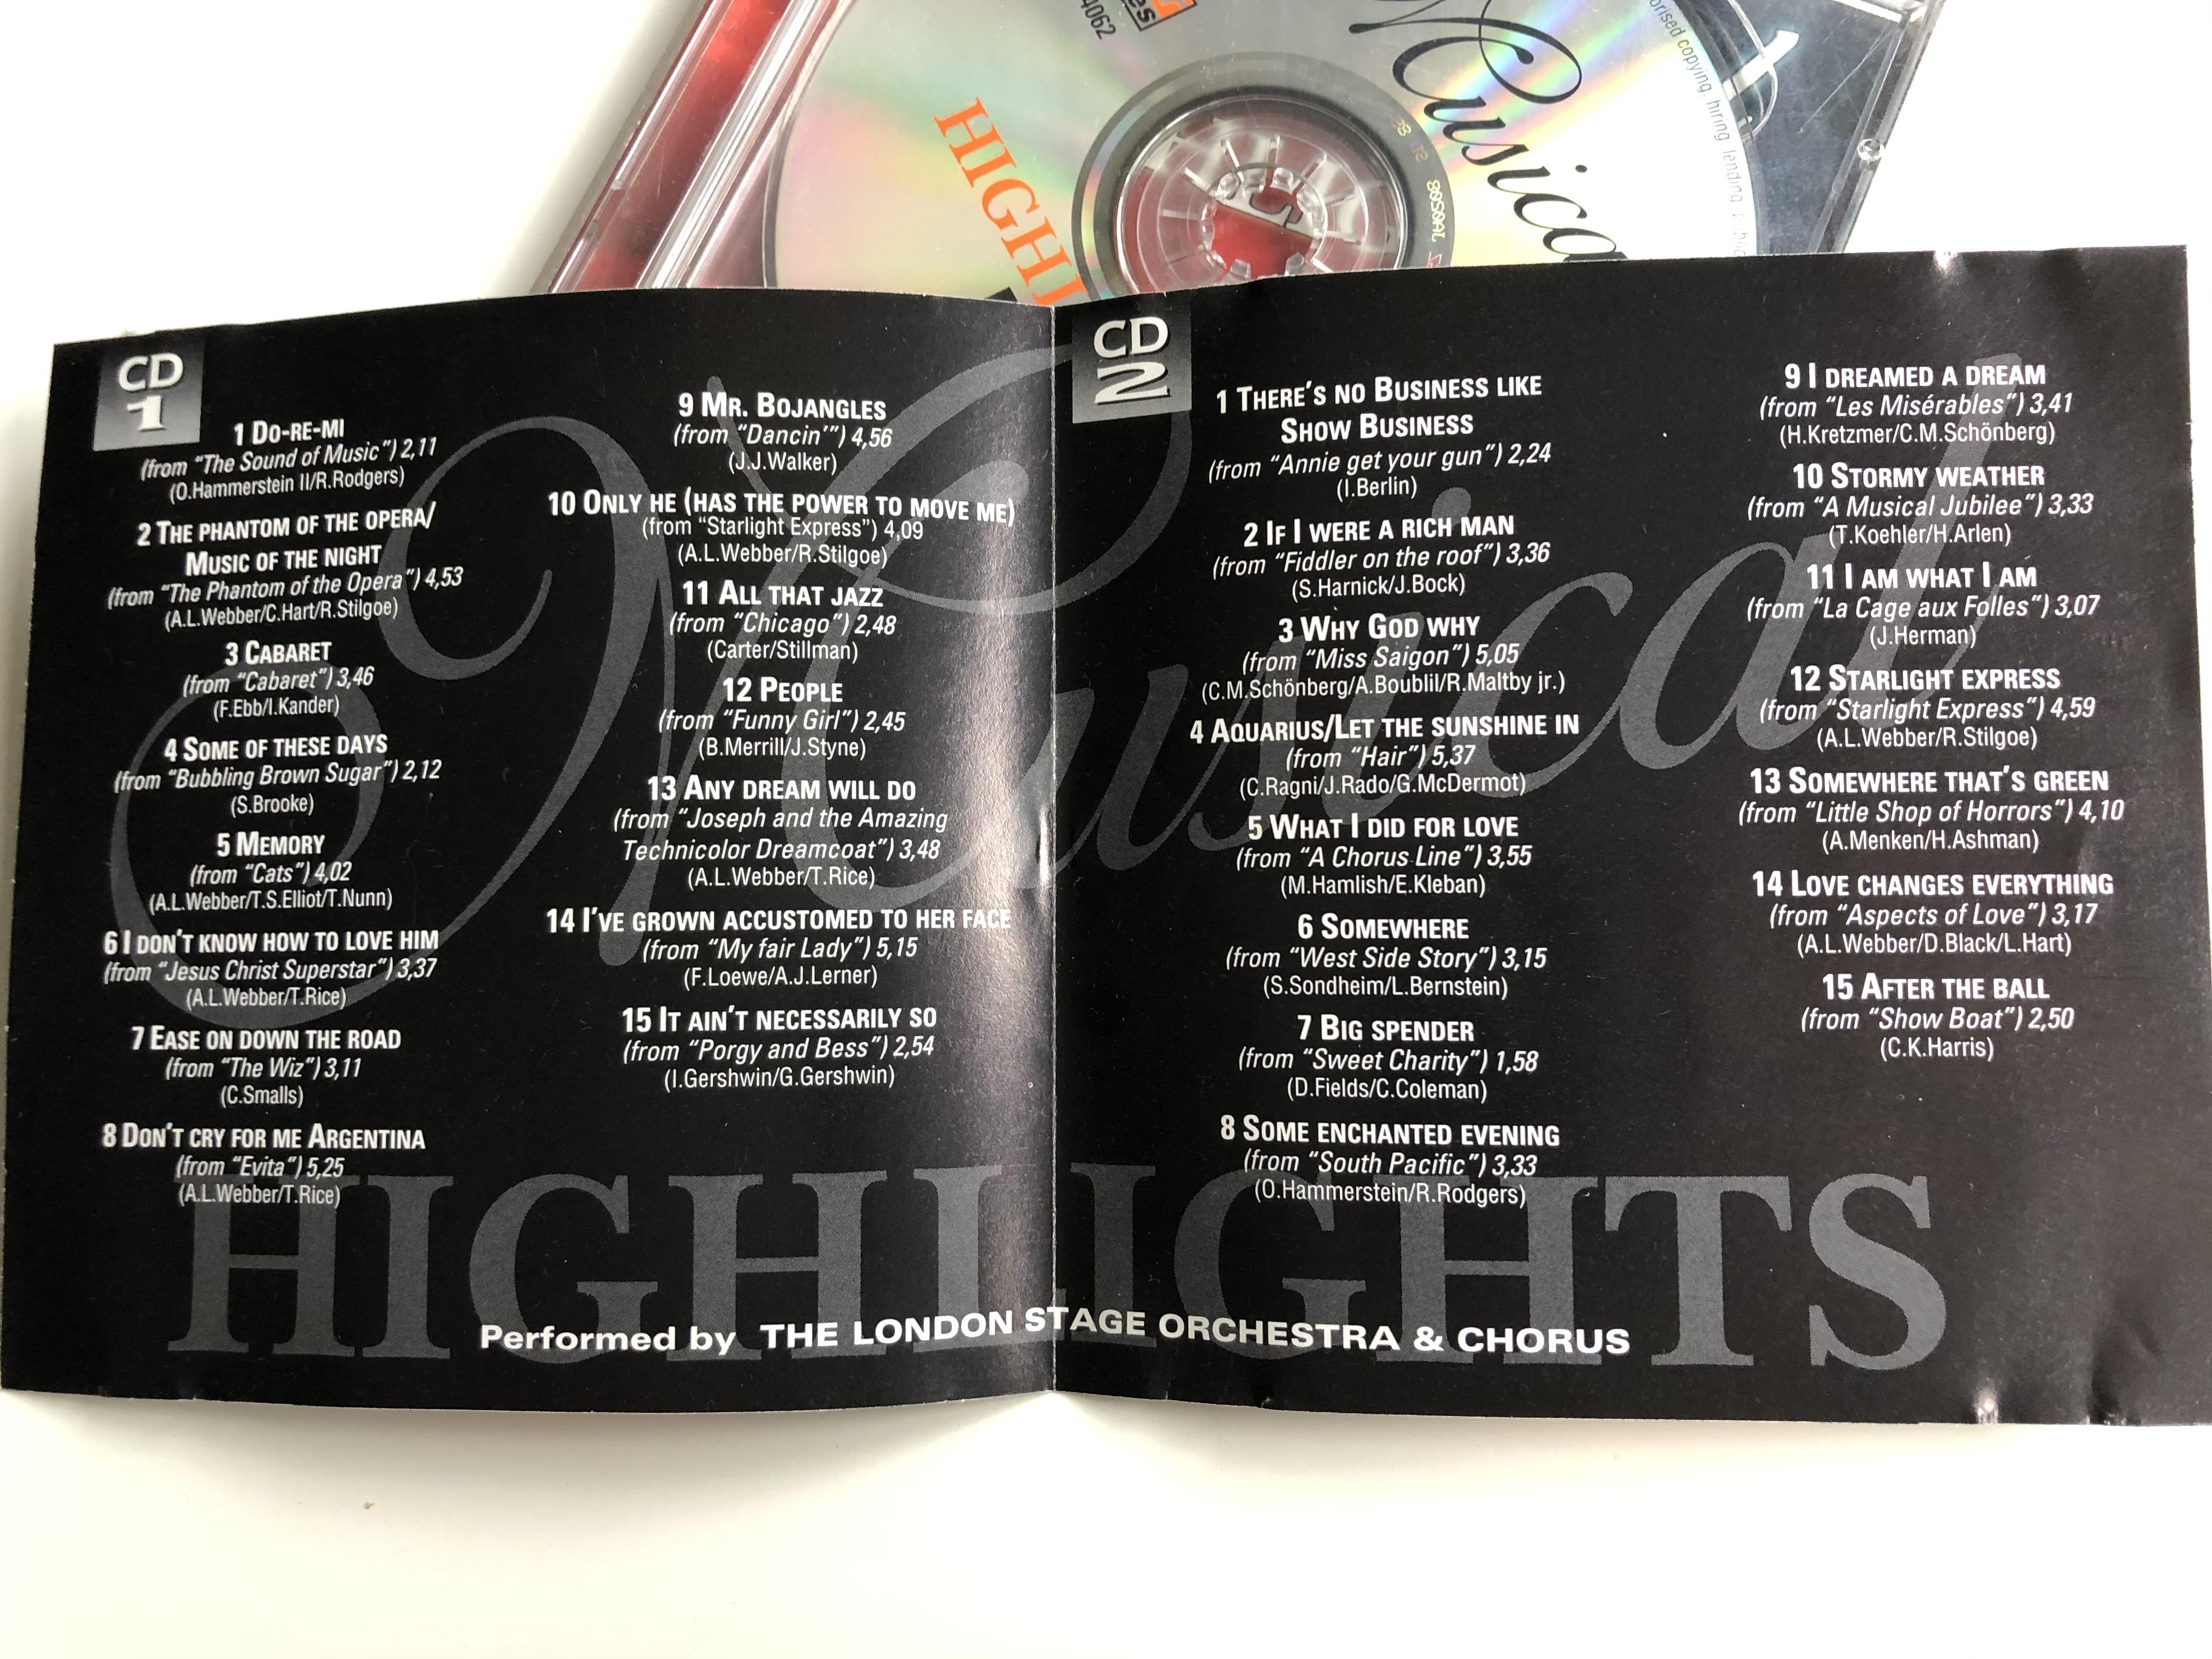 musical-highlights-jesus-christ-superstar-cabaret-evita-the-phantom-of-the-opera-starlight-express-cats-chicago-west-side-story-hair-super-doubles-2x-audio-cd-1998-sd-854062-2-.jpg